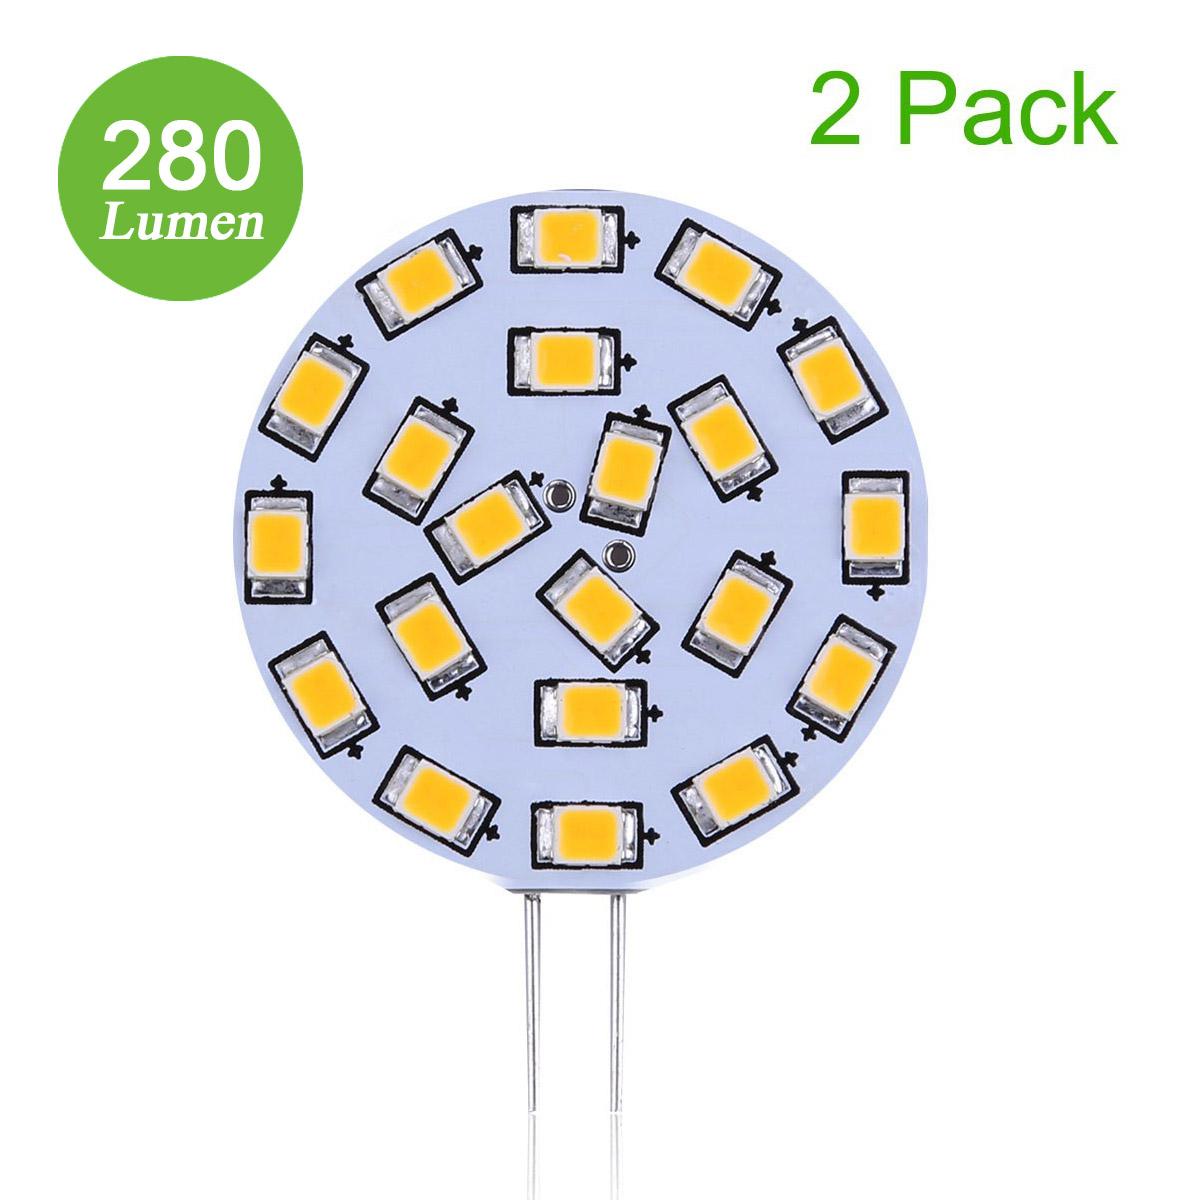 3W G4 LED Stiftsockellampe mit 21 LEDs, 12V 280lm Bi-Pin Disc Lampe, ersetzt 40W Halogenlampe, Warmweiß